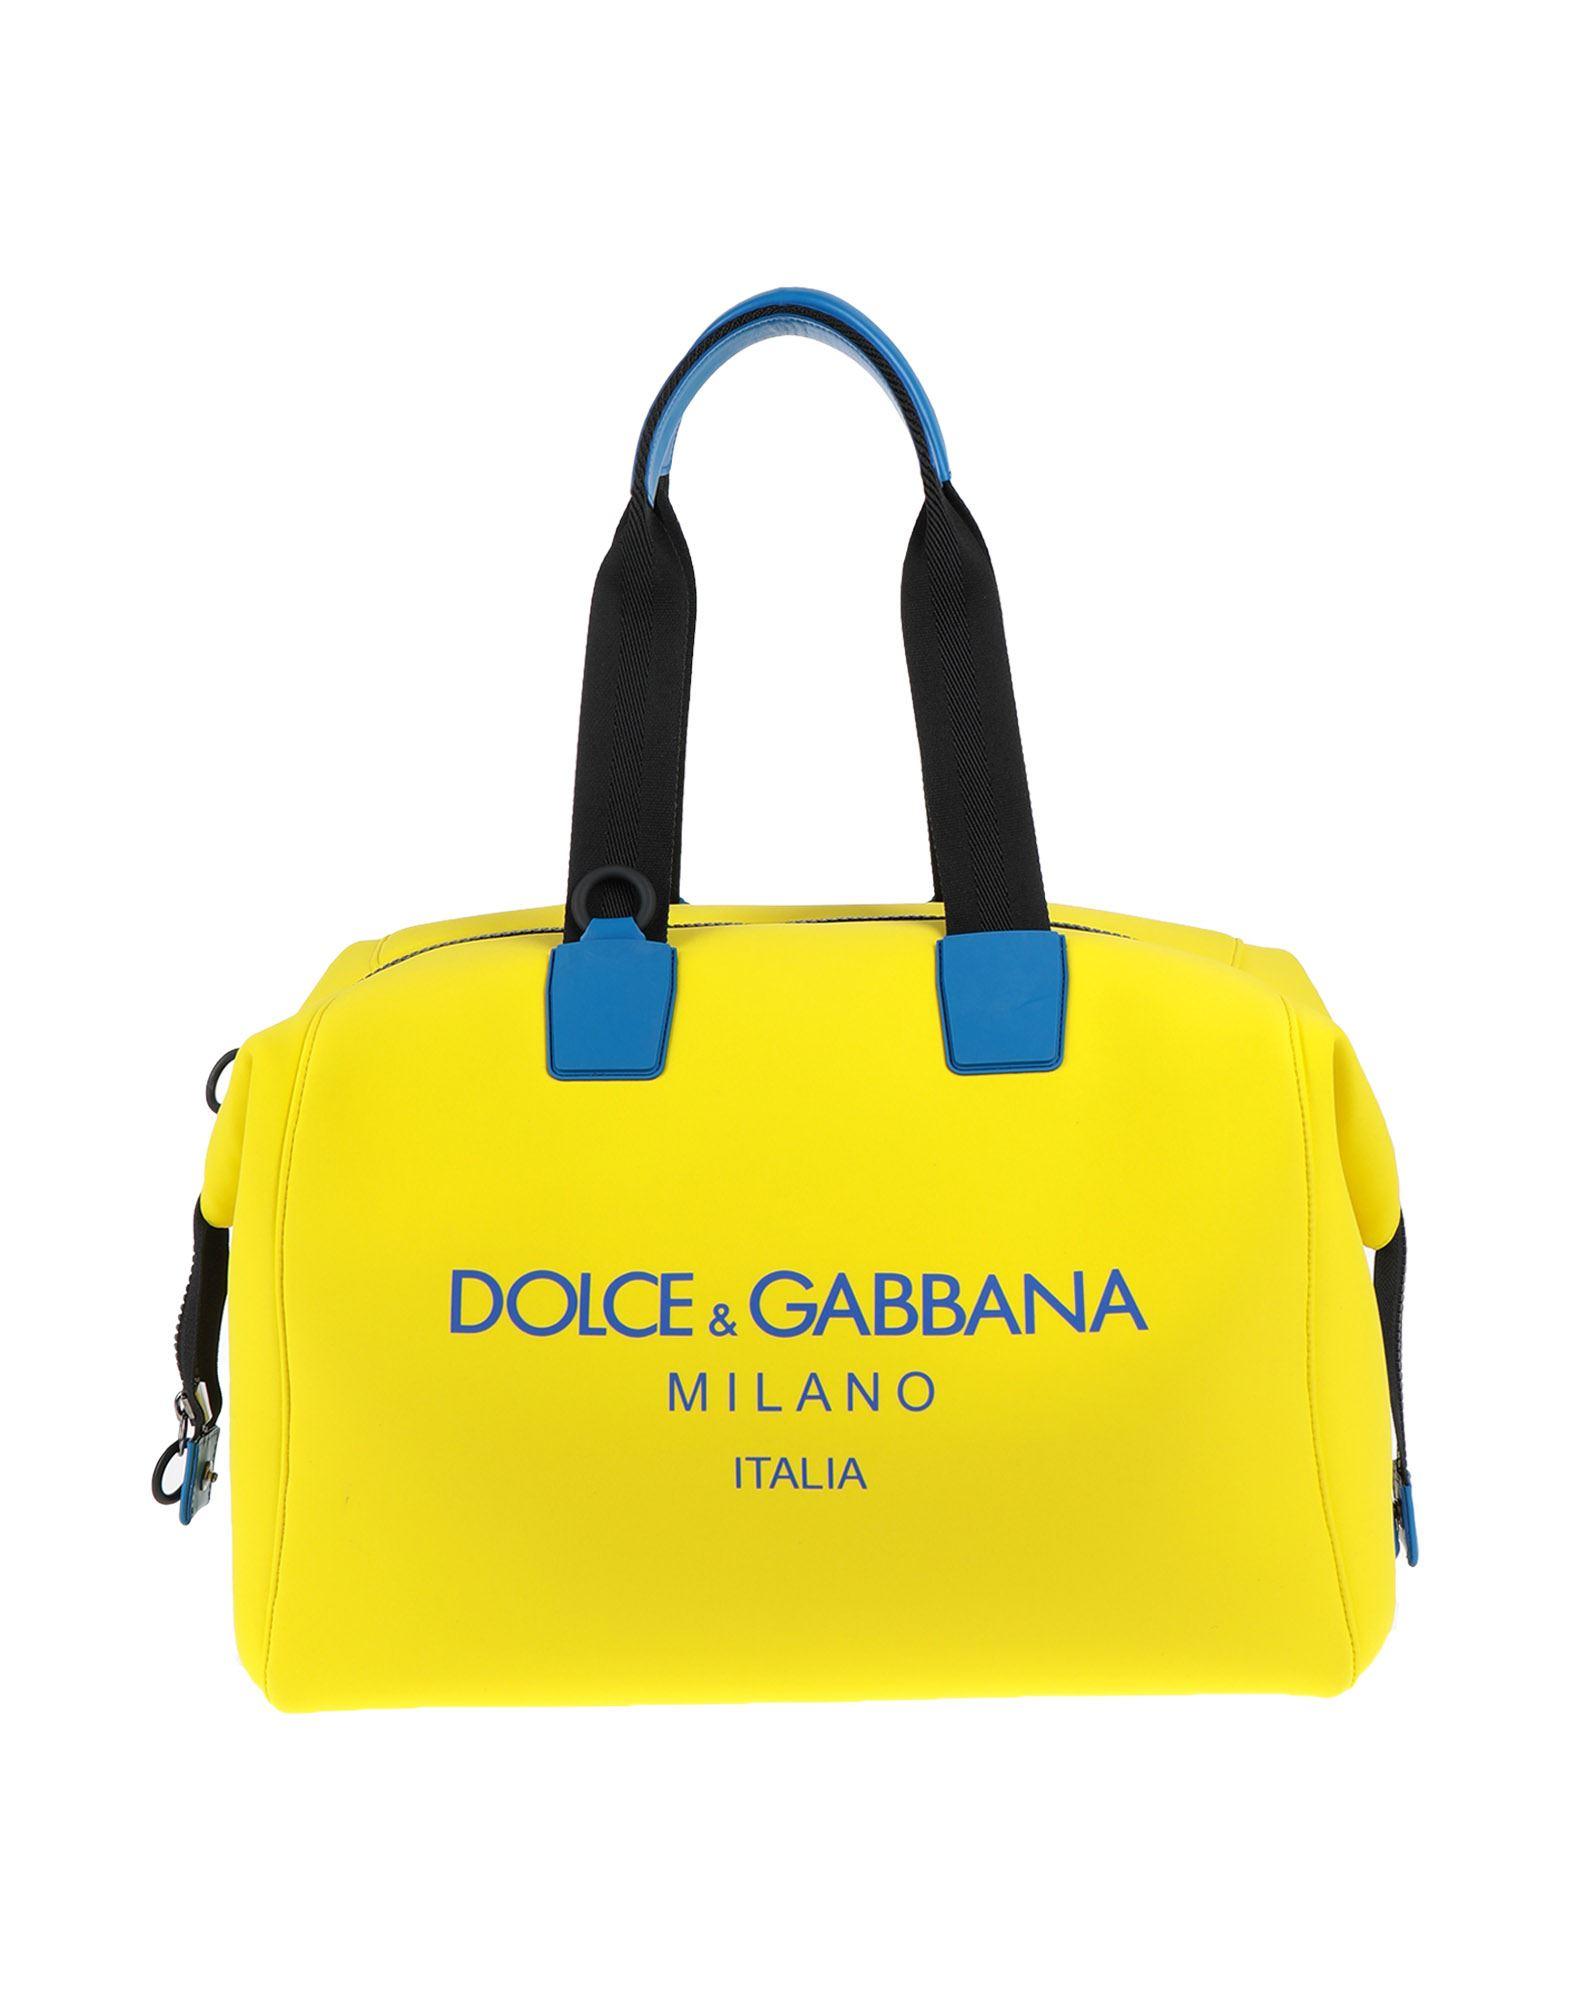 DOLCE & GABBANA Travel duffel bags - Item 55020769